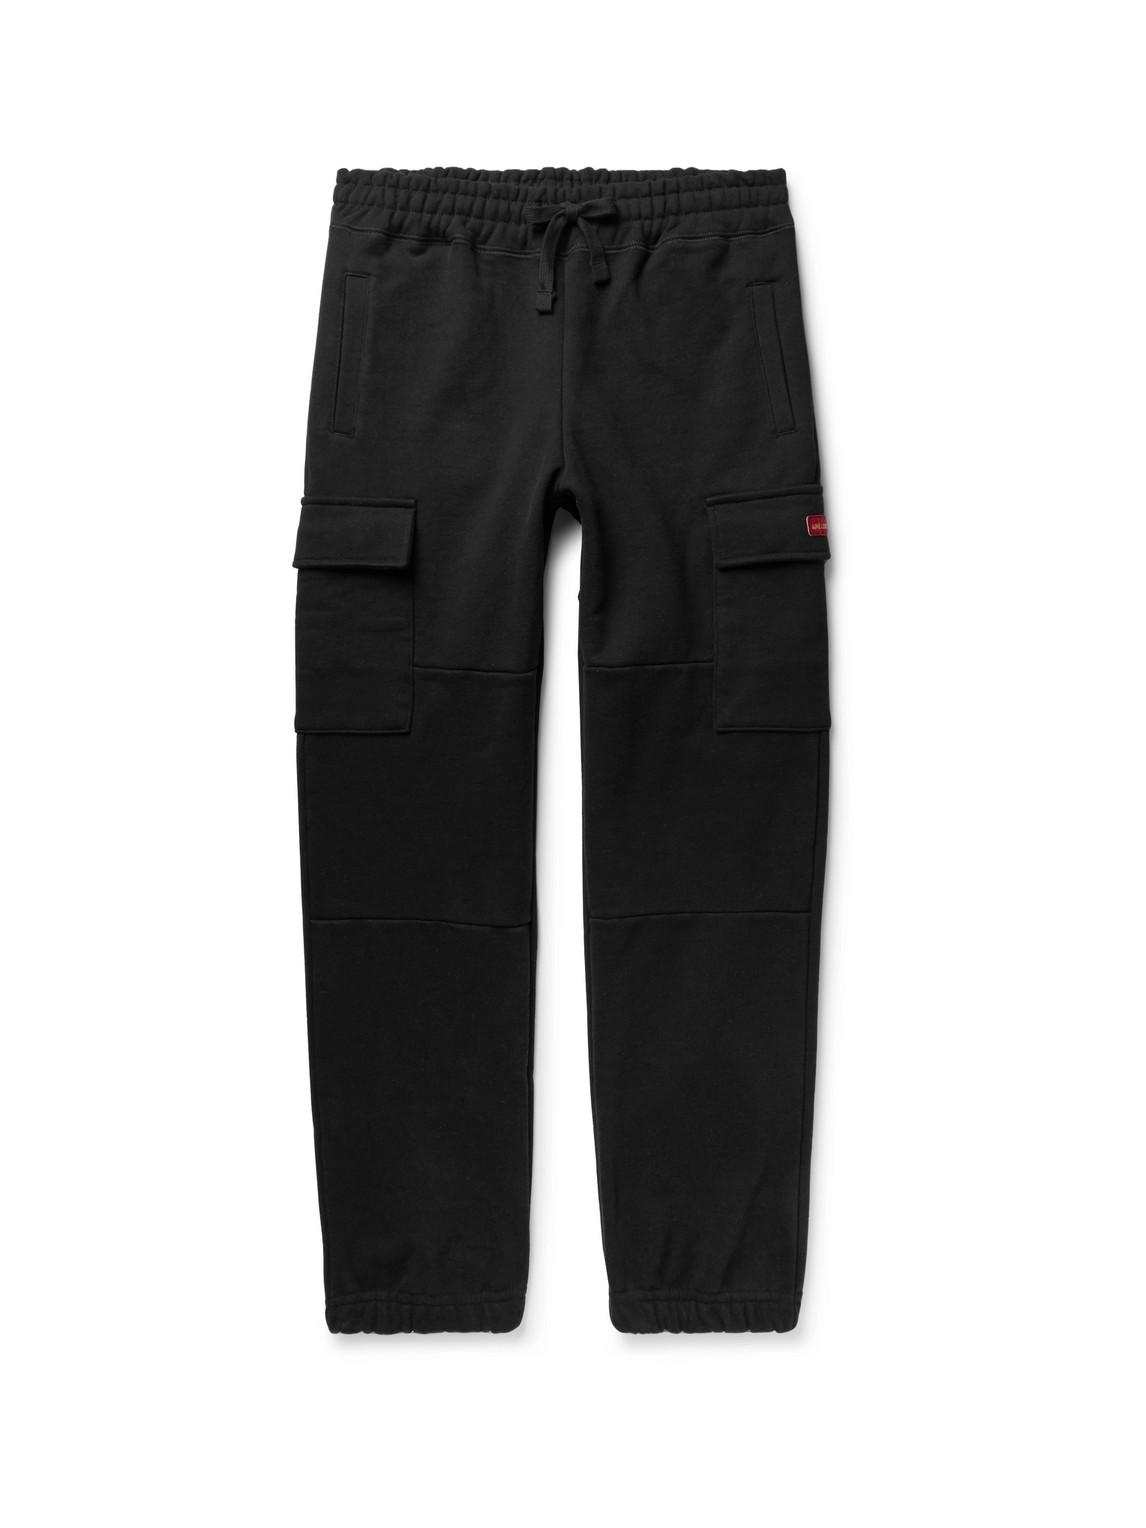 aimé leon dore - tapered loopback cotton-jersey cargo sweatpants - men - black - xl